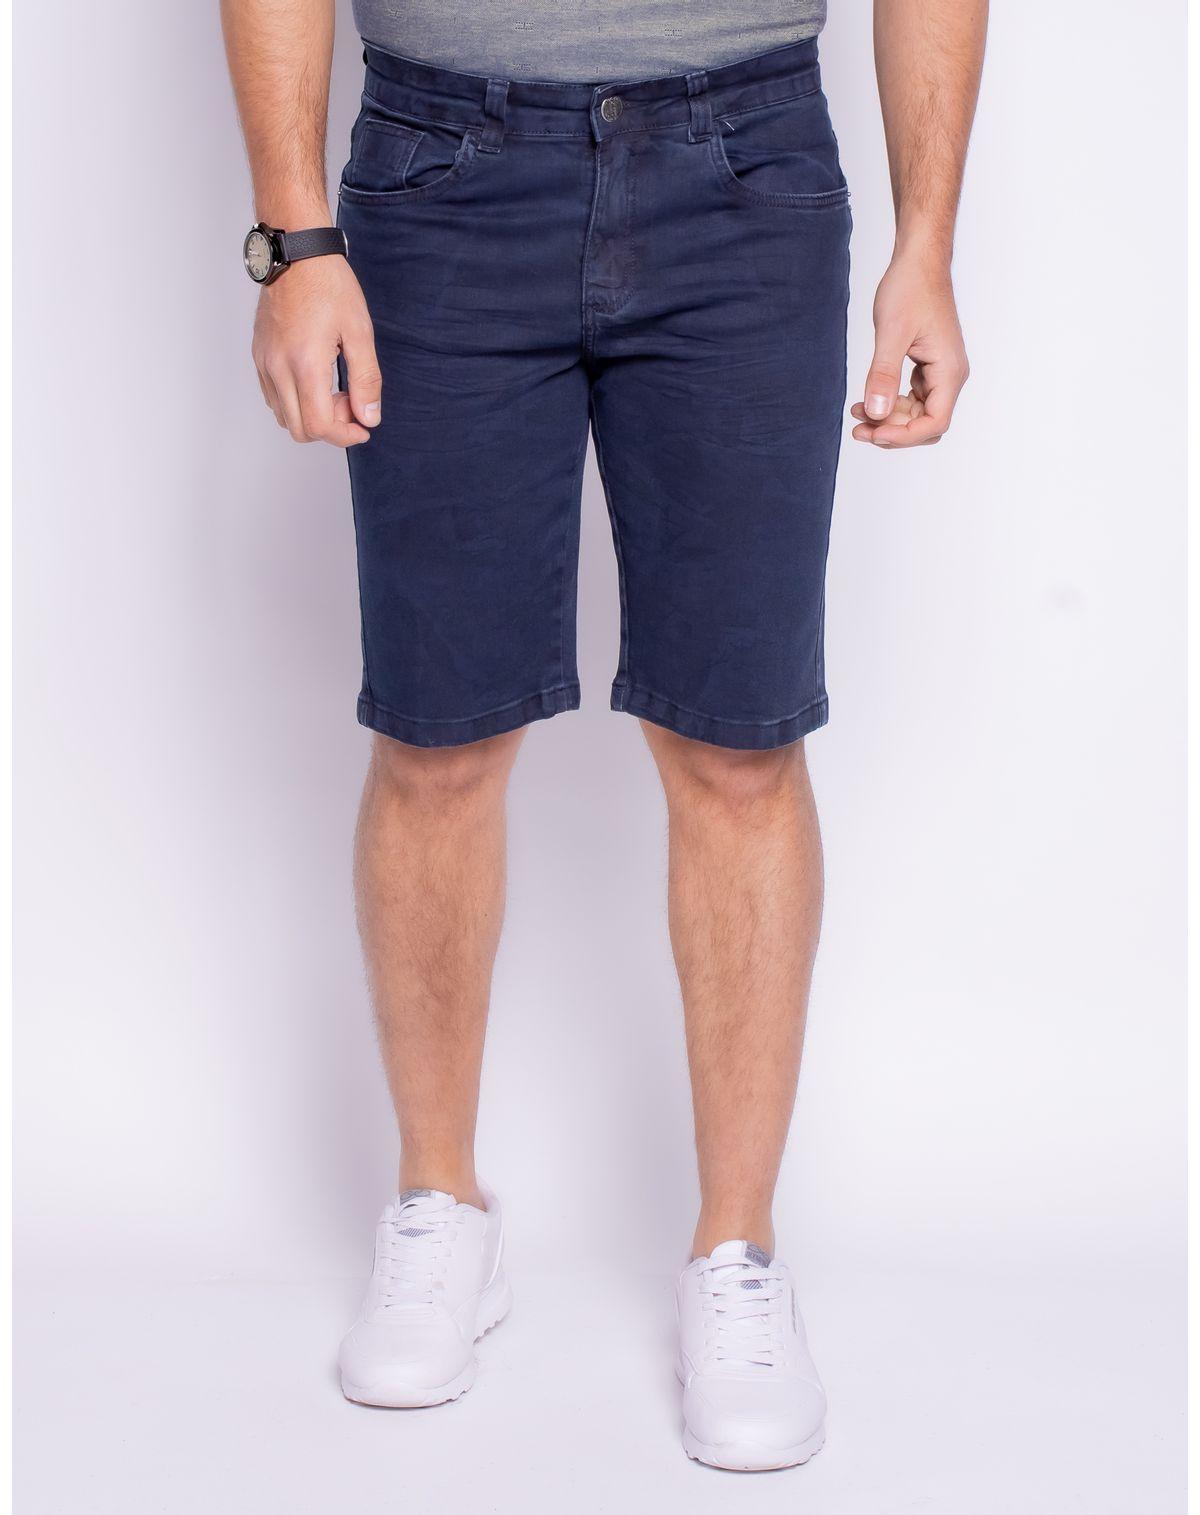 567614002-bermuda-jeans-escura-masculina-bolsos-jeans-40-53d